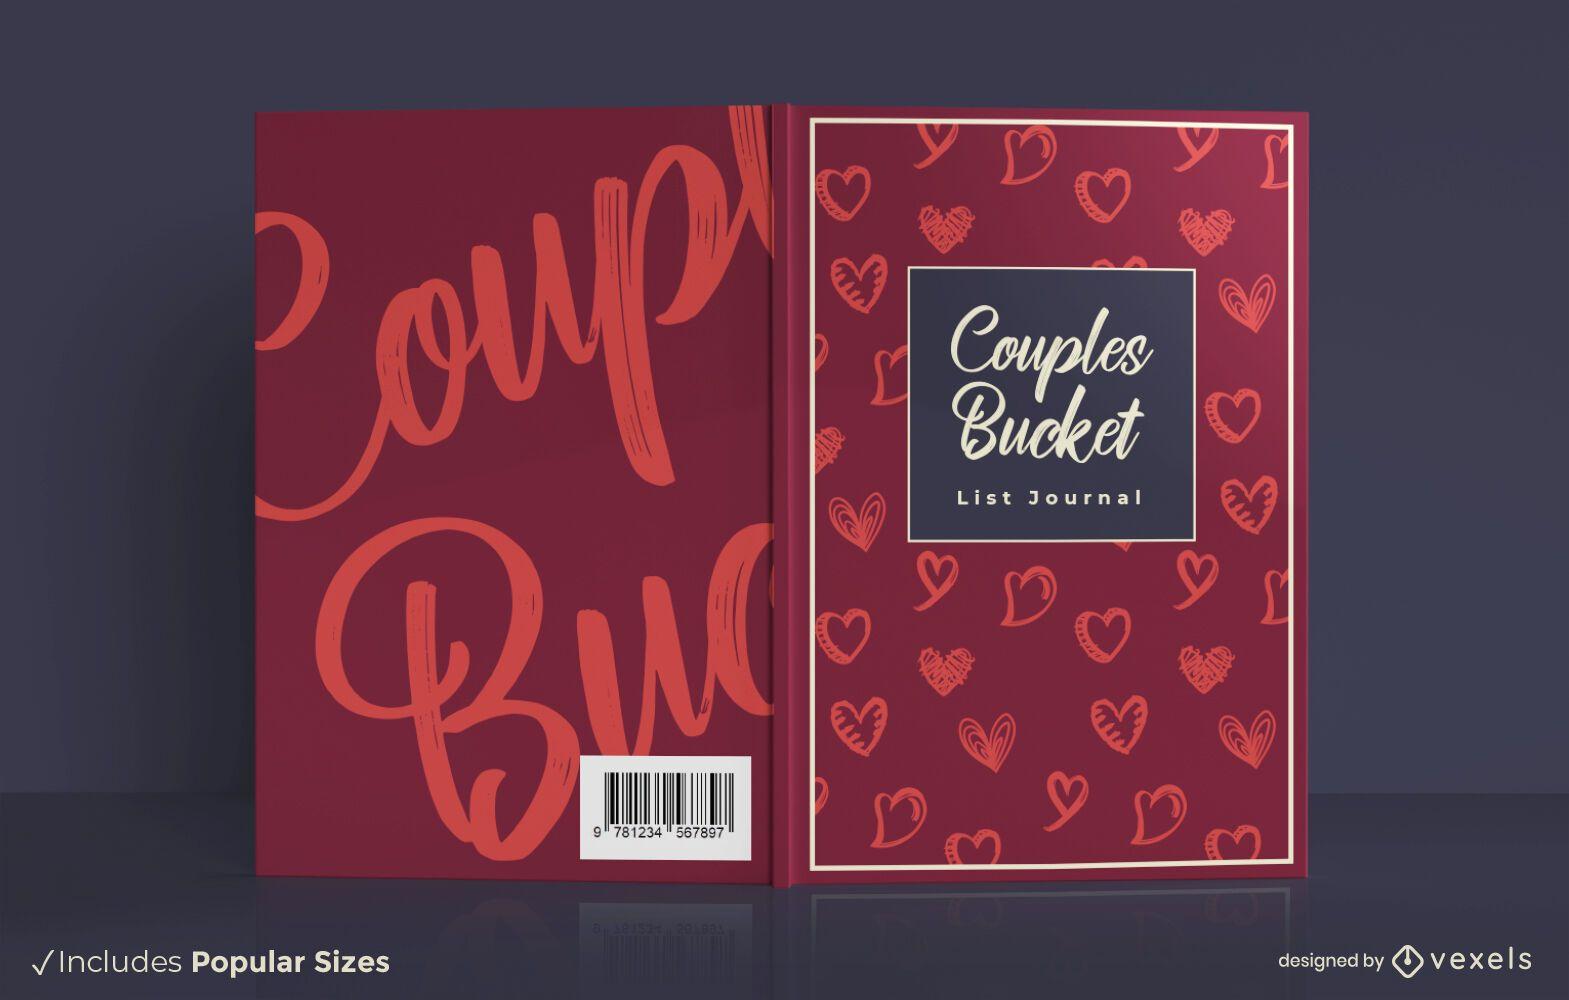 Couples bucket book cover design